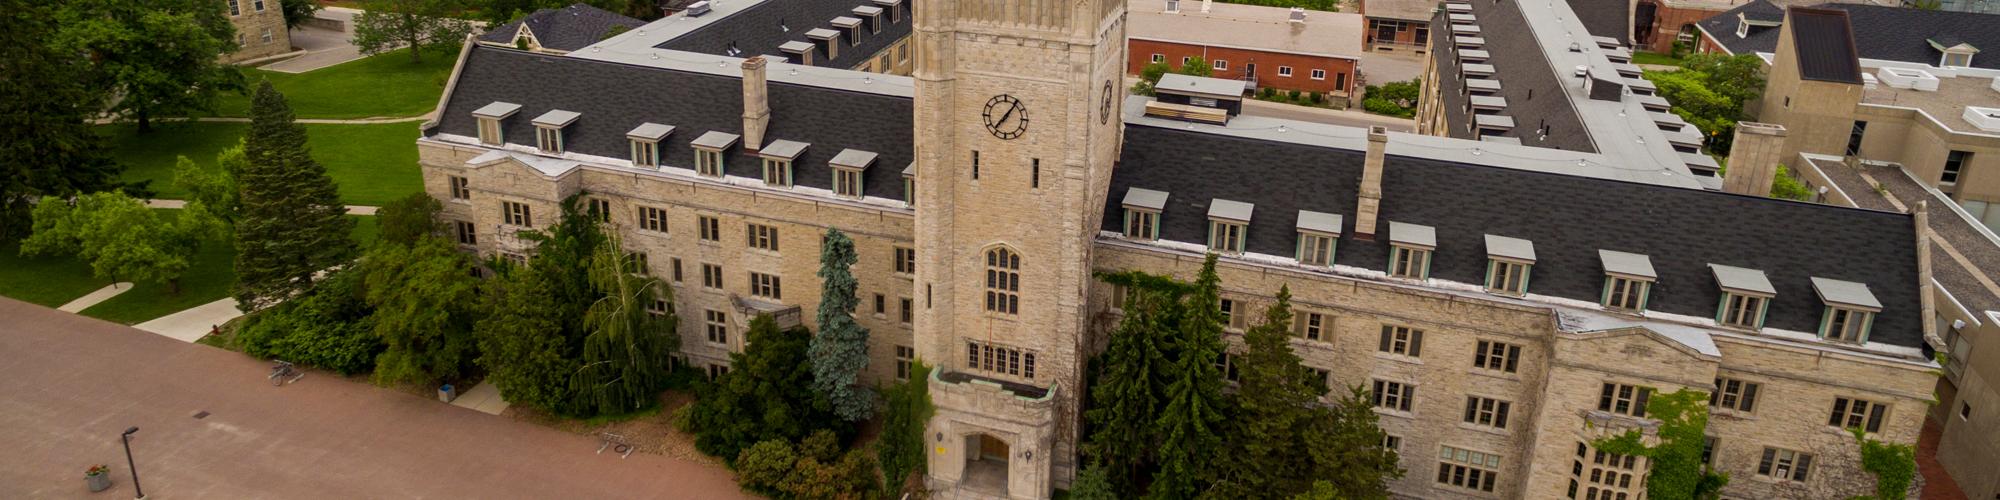 Faculty Recruitment | University of Guelph 2019